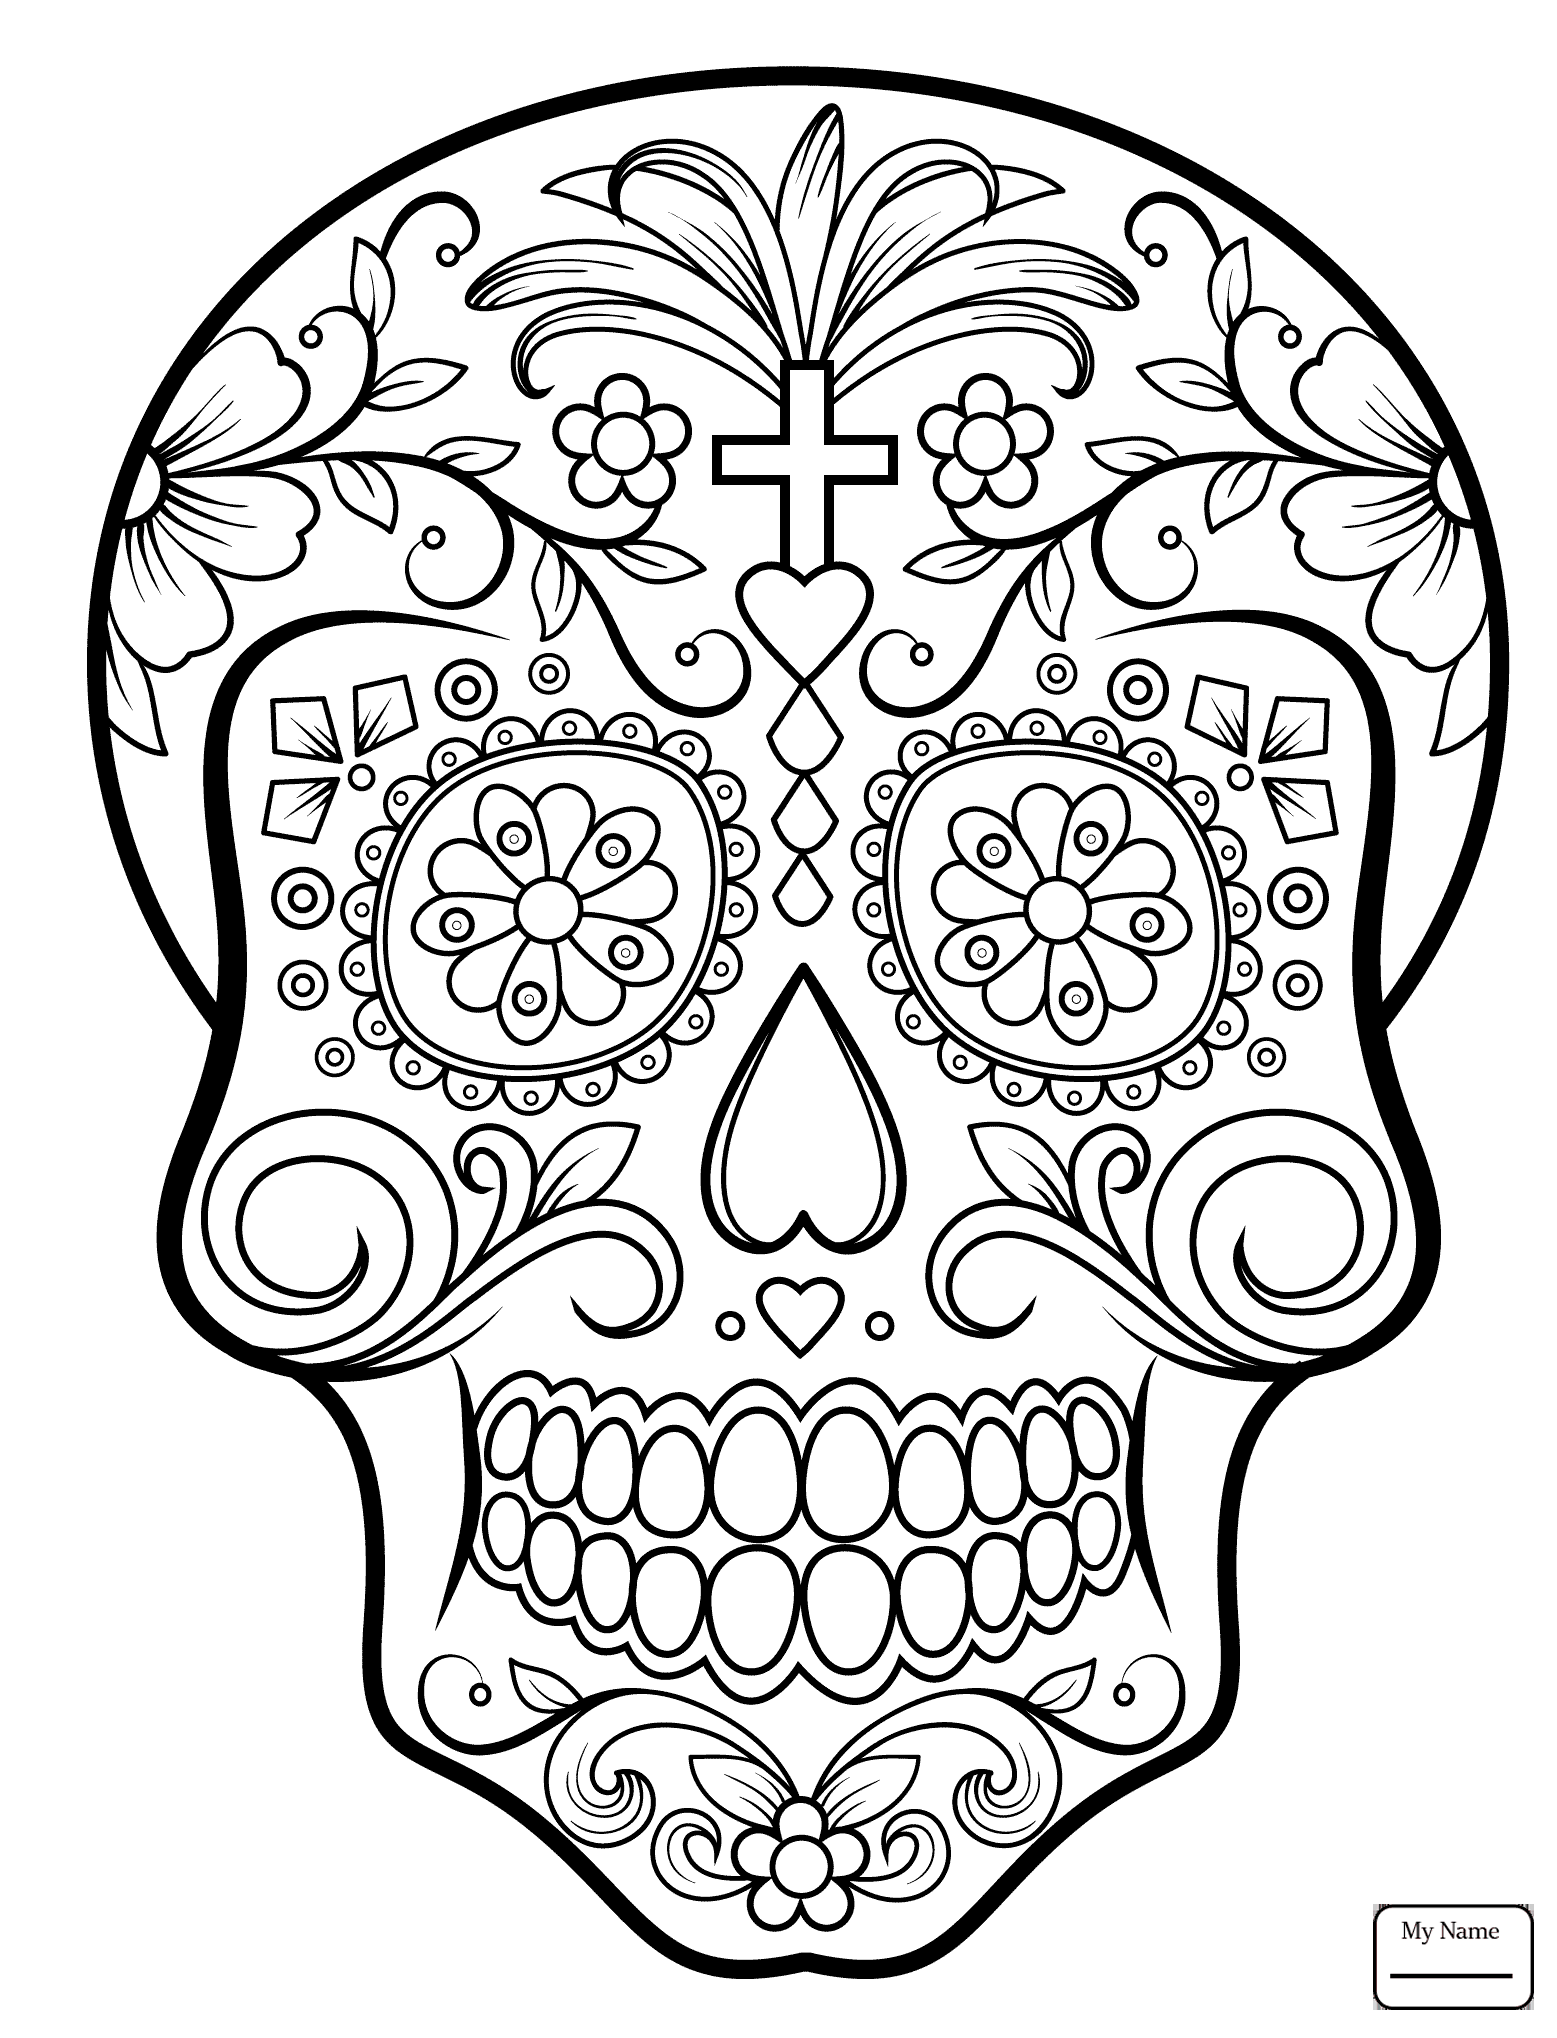 Skulls Step By Step Drawing at GetDrawings | Free download